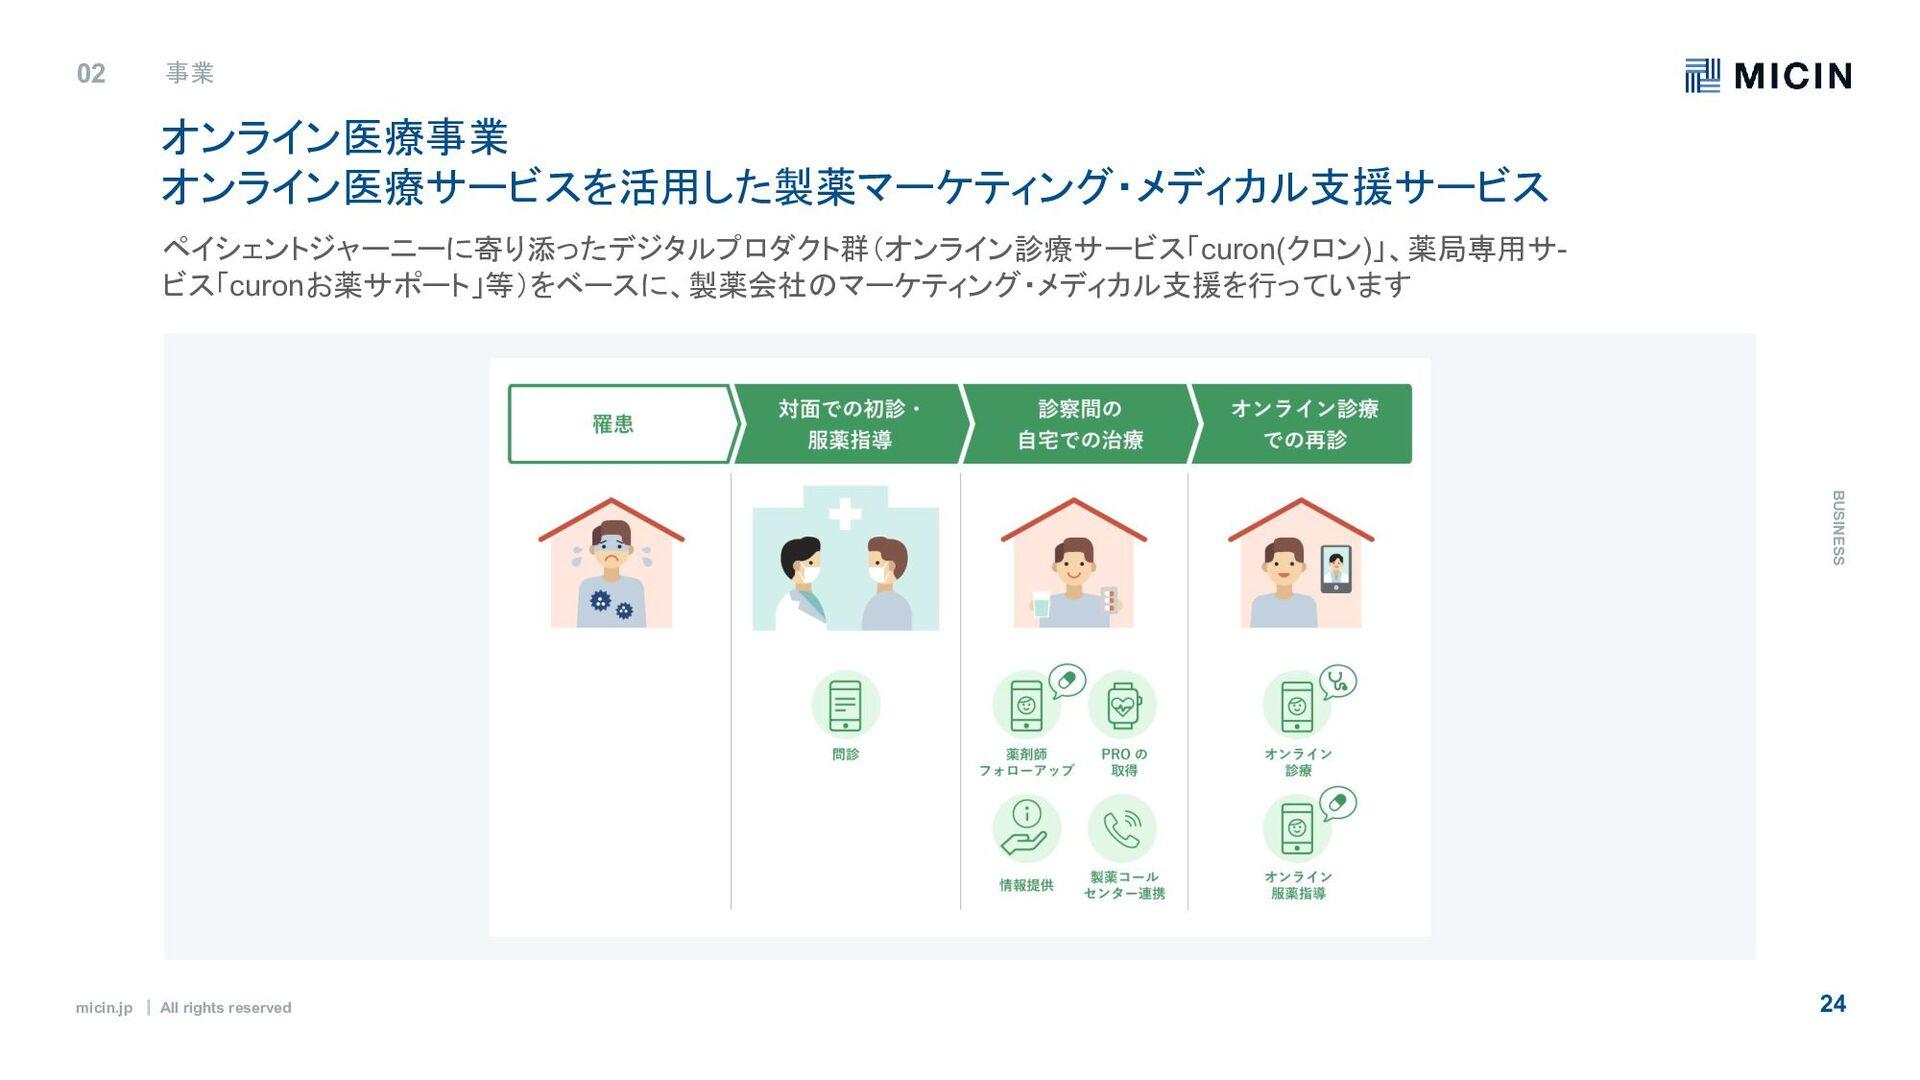 micin.jp ʛ All rights reserved 24 ۀ༰ 02 ۀ B ...